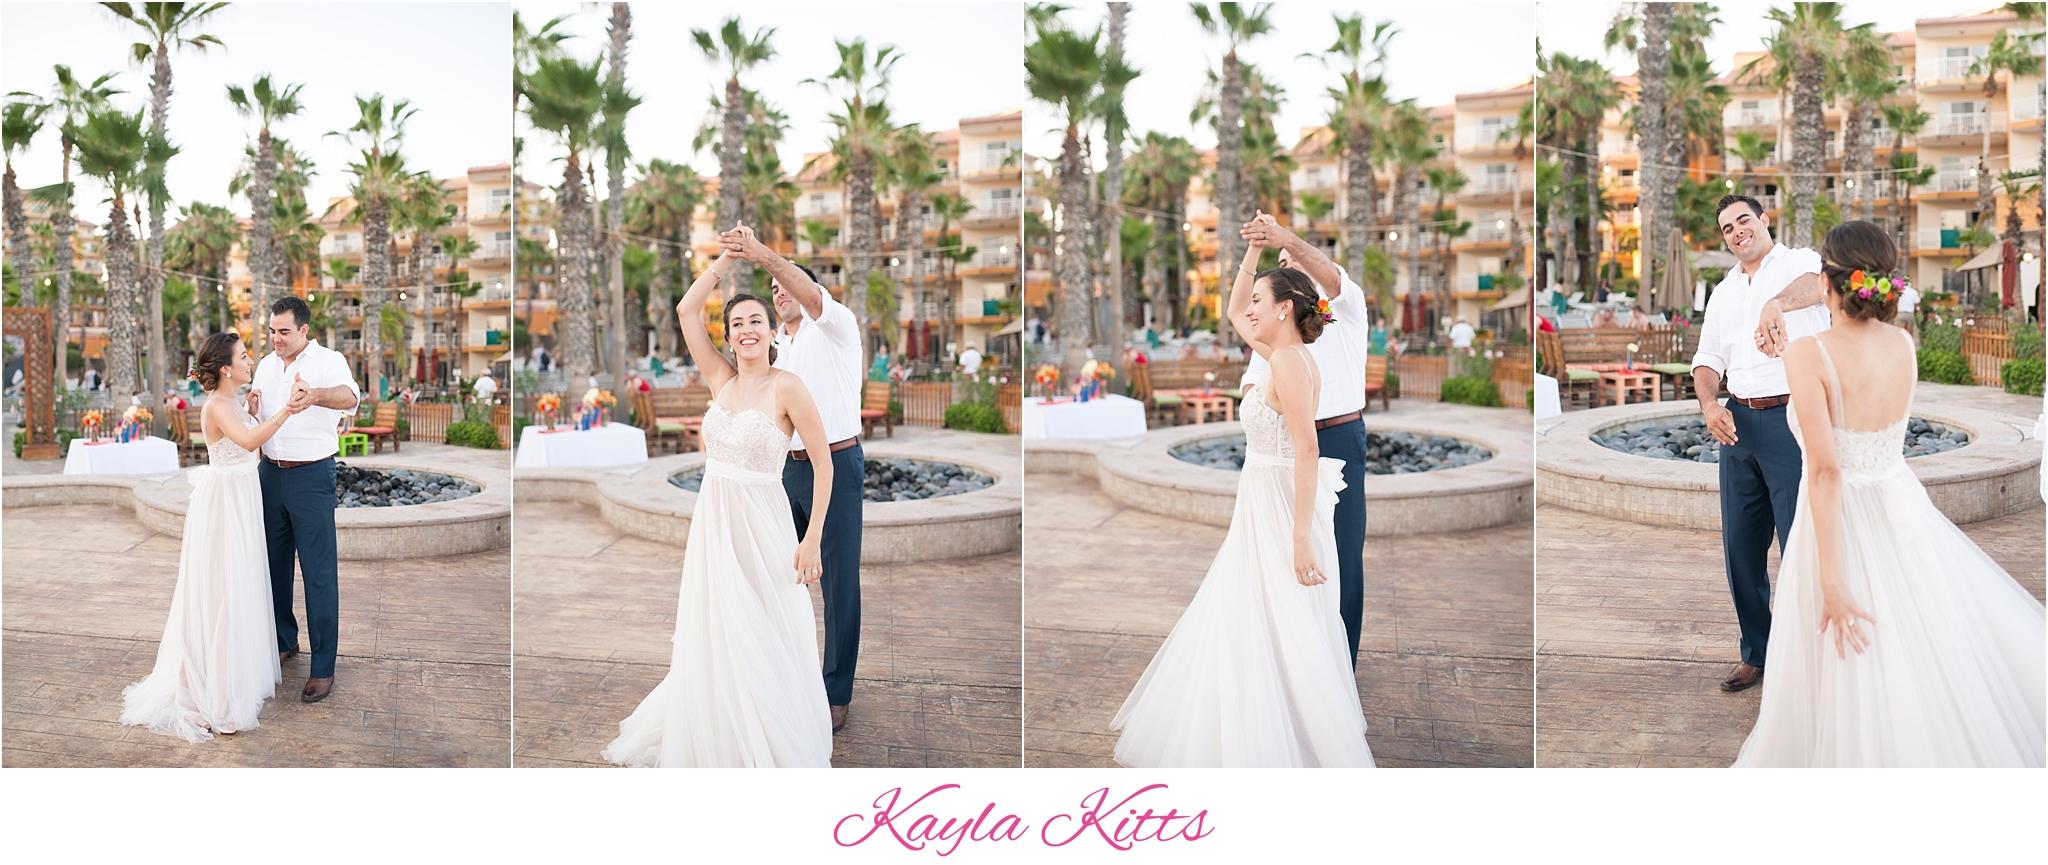 kayla kitts photography-travis and sarah-cabo wedding-cabo wedding photographer-destination wedding photographer-paris wedding photographer-albuquerque wedding-matt jones-albuquerque wedding vendor-intimate wedding_0035.jpg